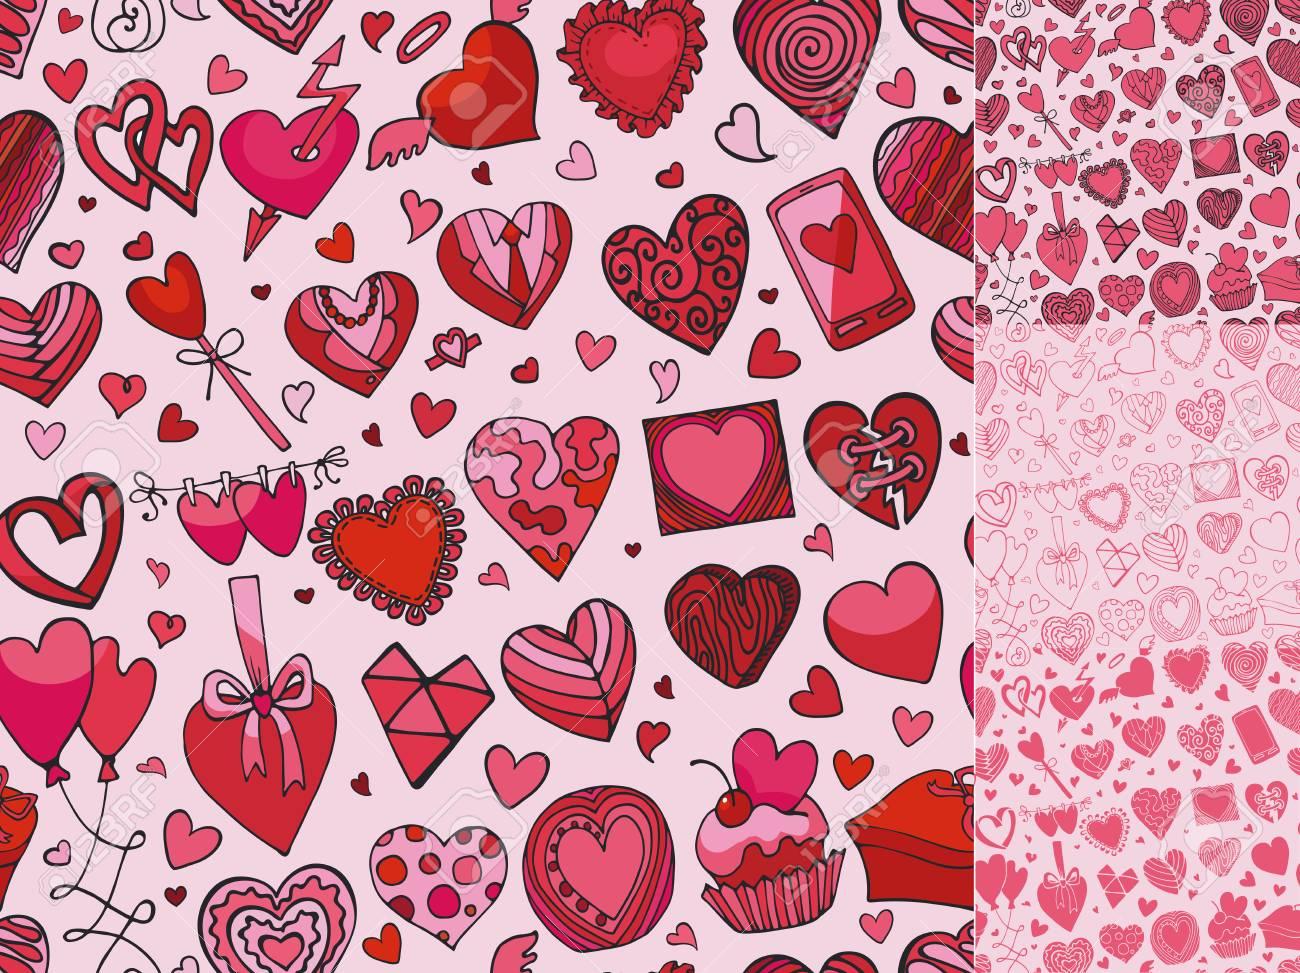 Heart Icons Seamless Patternlentineweddinglove Symbols